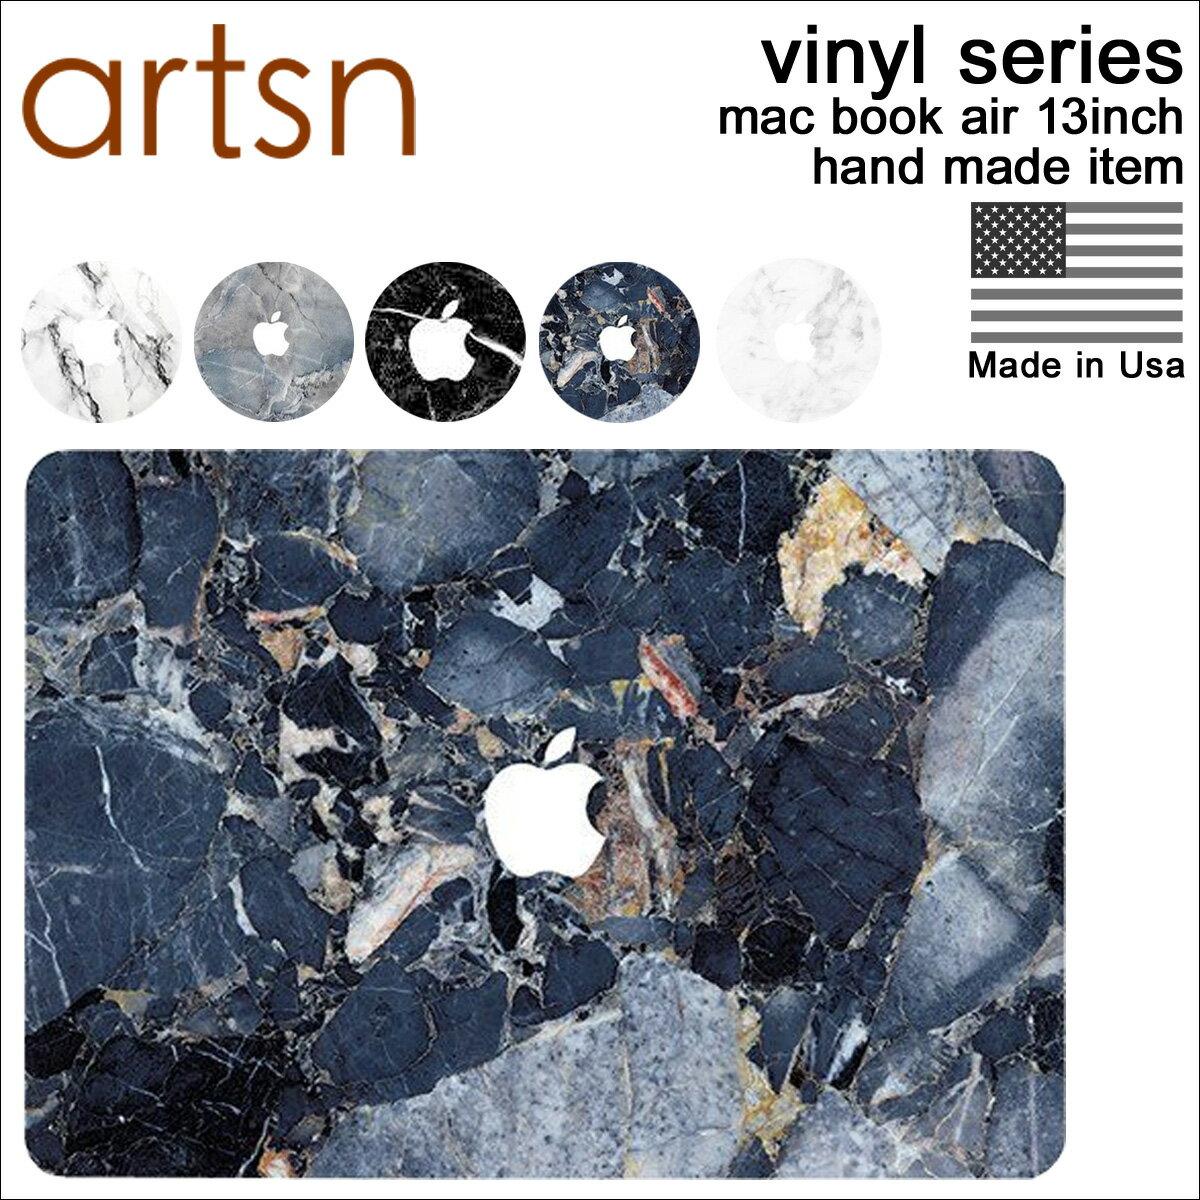 ARTSN アーツン MacBook Air 13 シール ケース マックブック エアー カバー 保護フィルム マーブル VINYL SERIES [12/28 追加入荷]